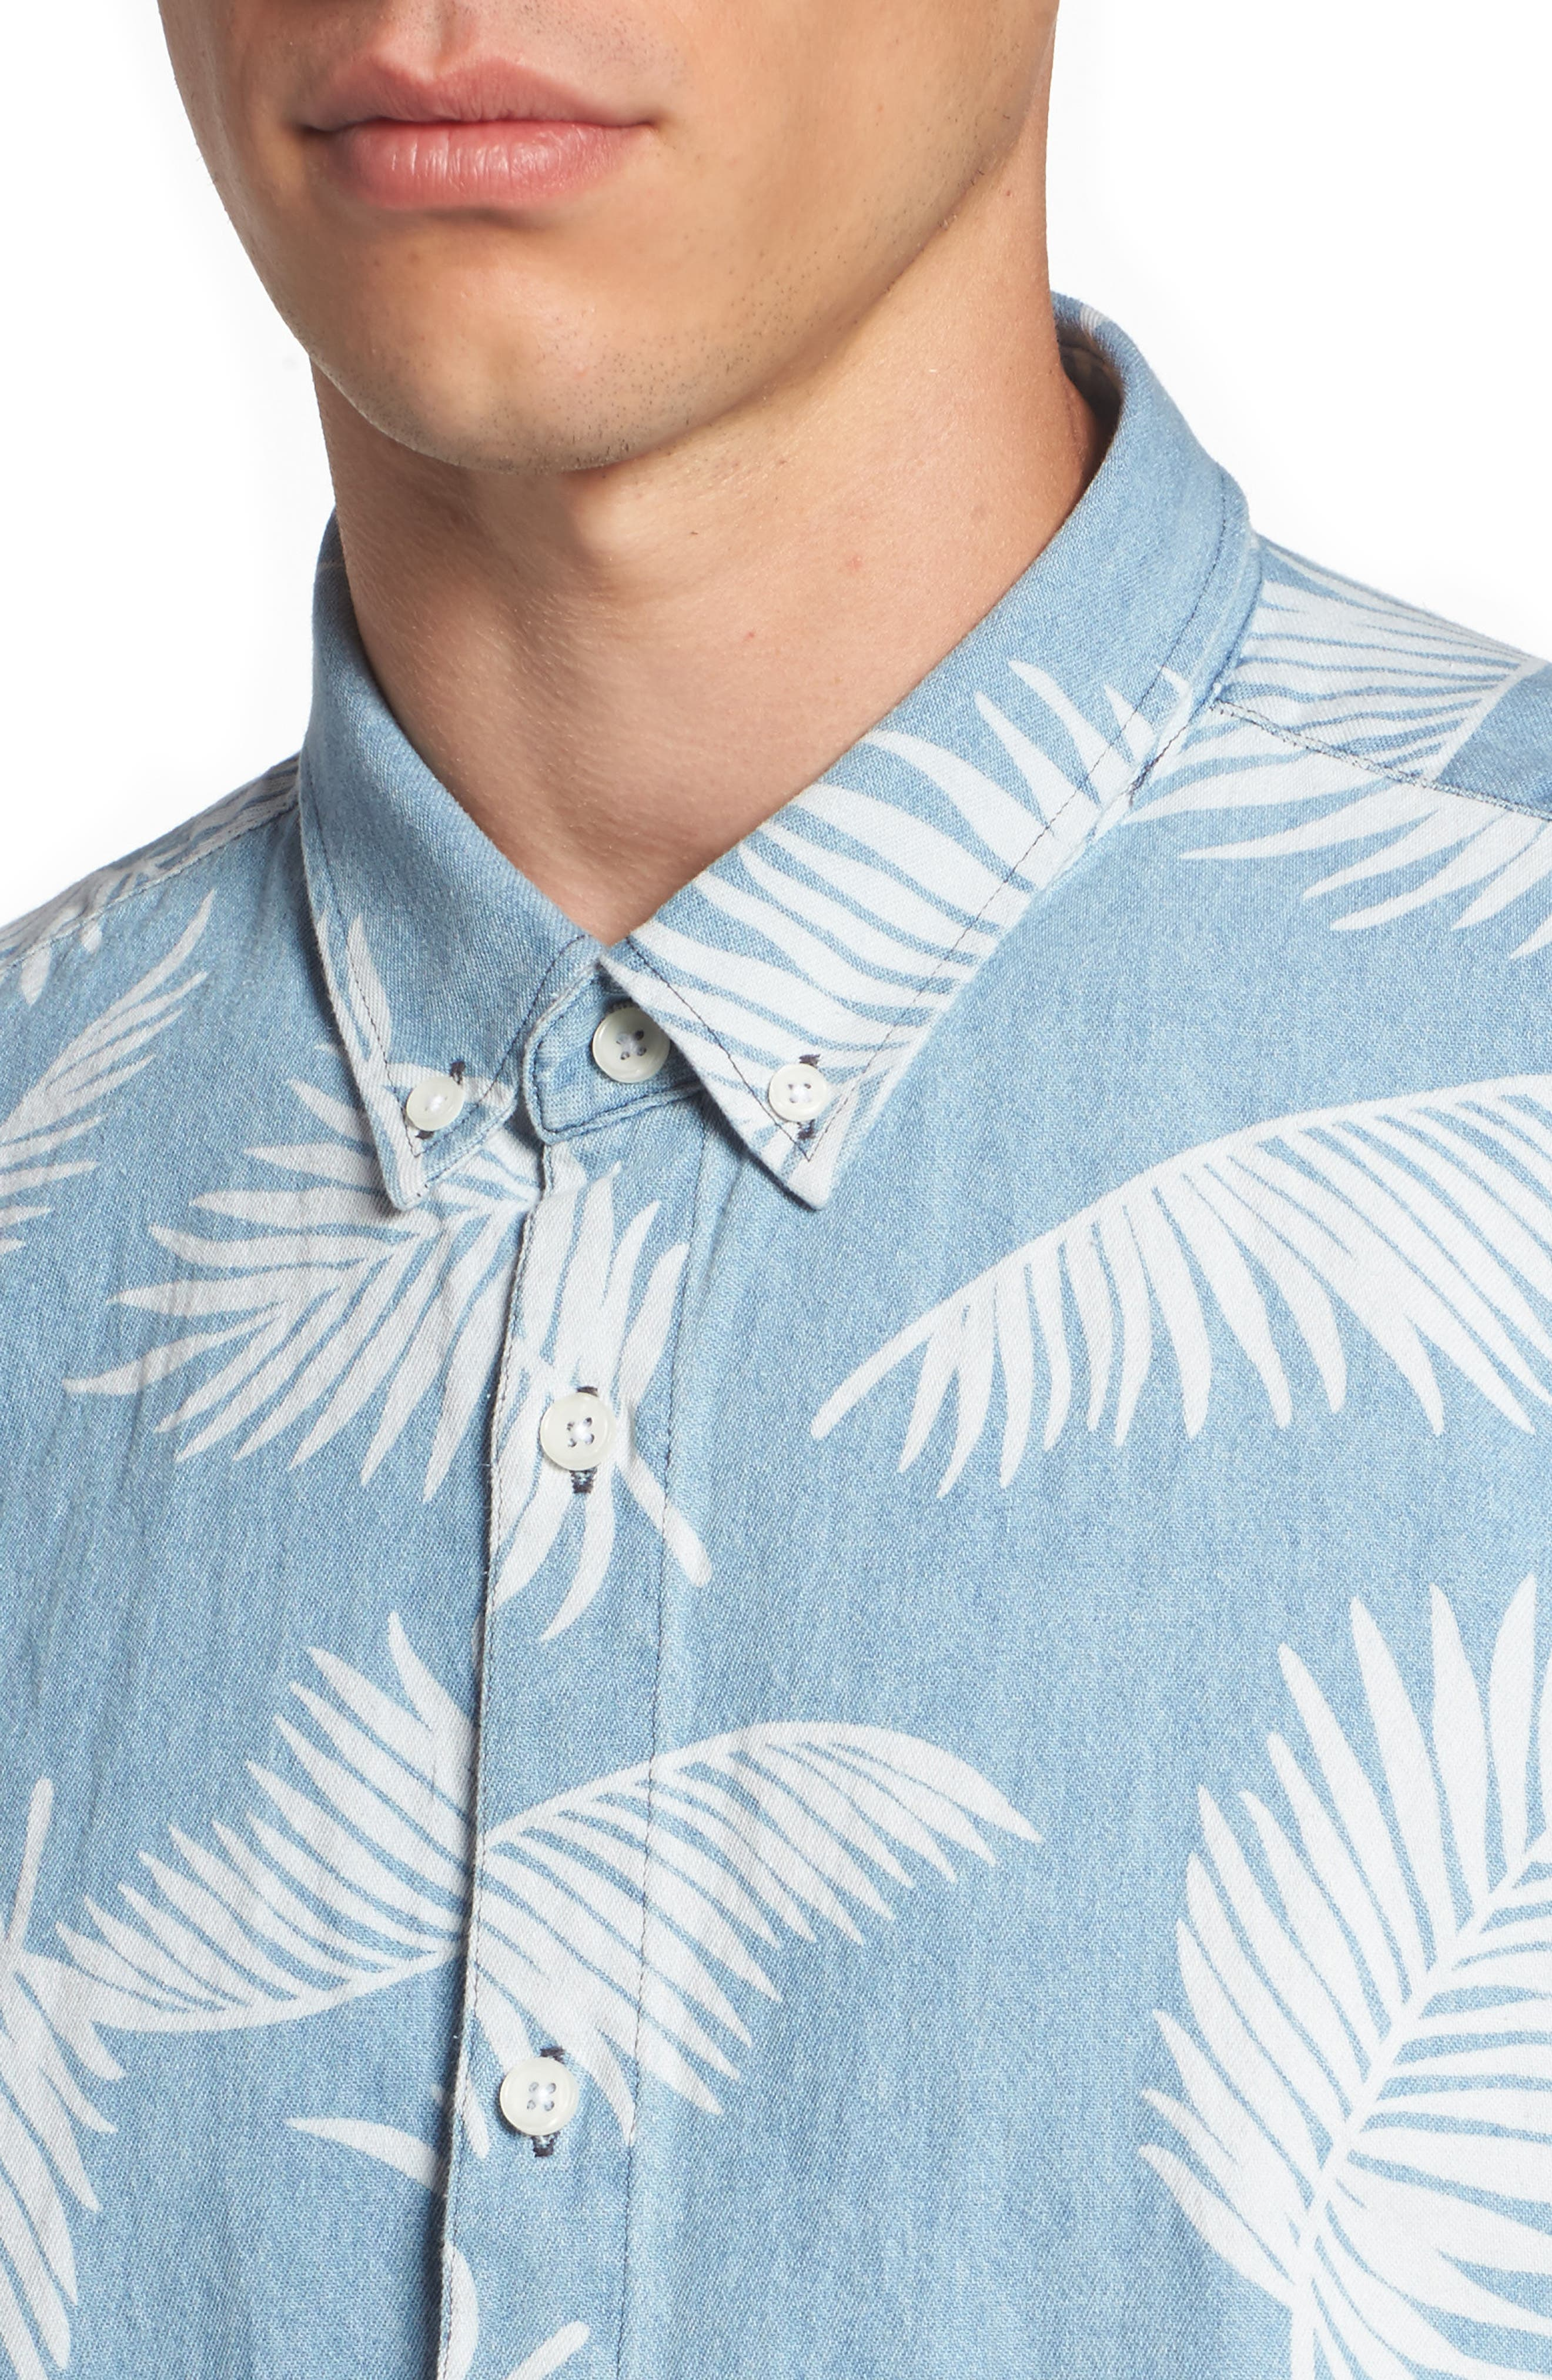 Bahamas Shirt,                             Alternate thumbnail 4, color,                             423